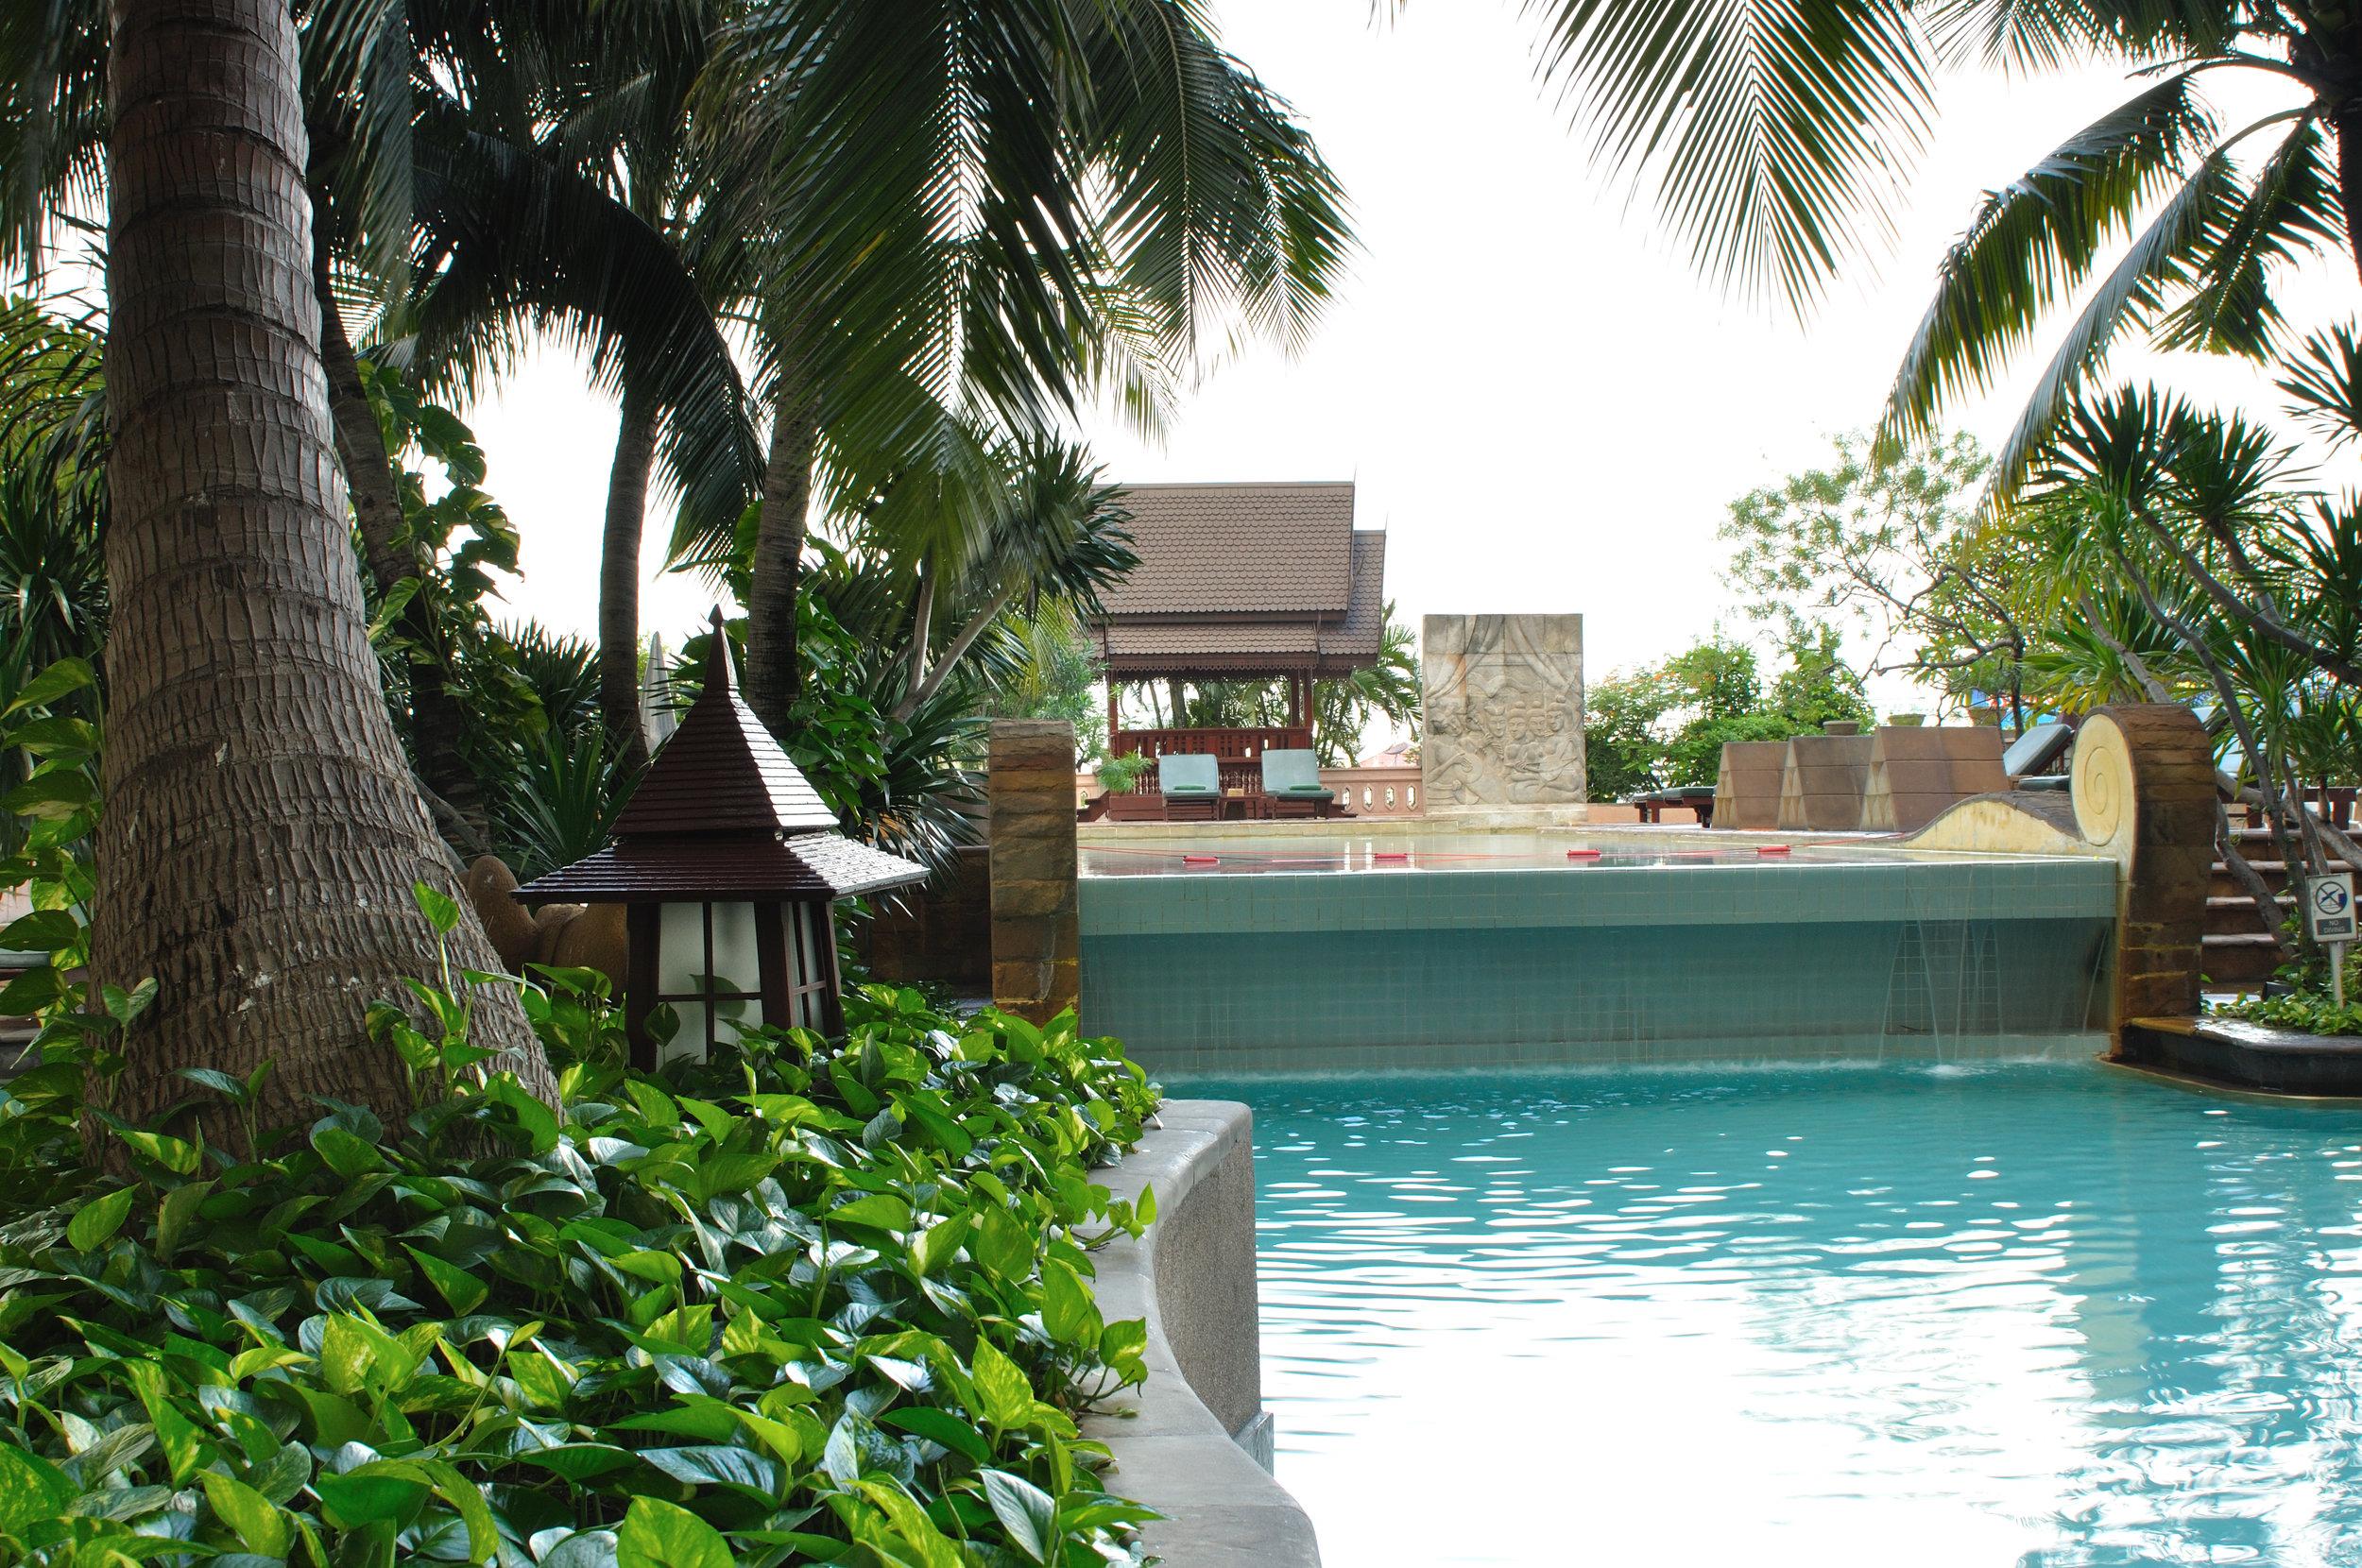 Century park hotel bangkok   BANGKOK    Images / Fact sheet / VIdEo